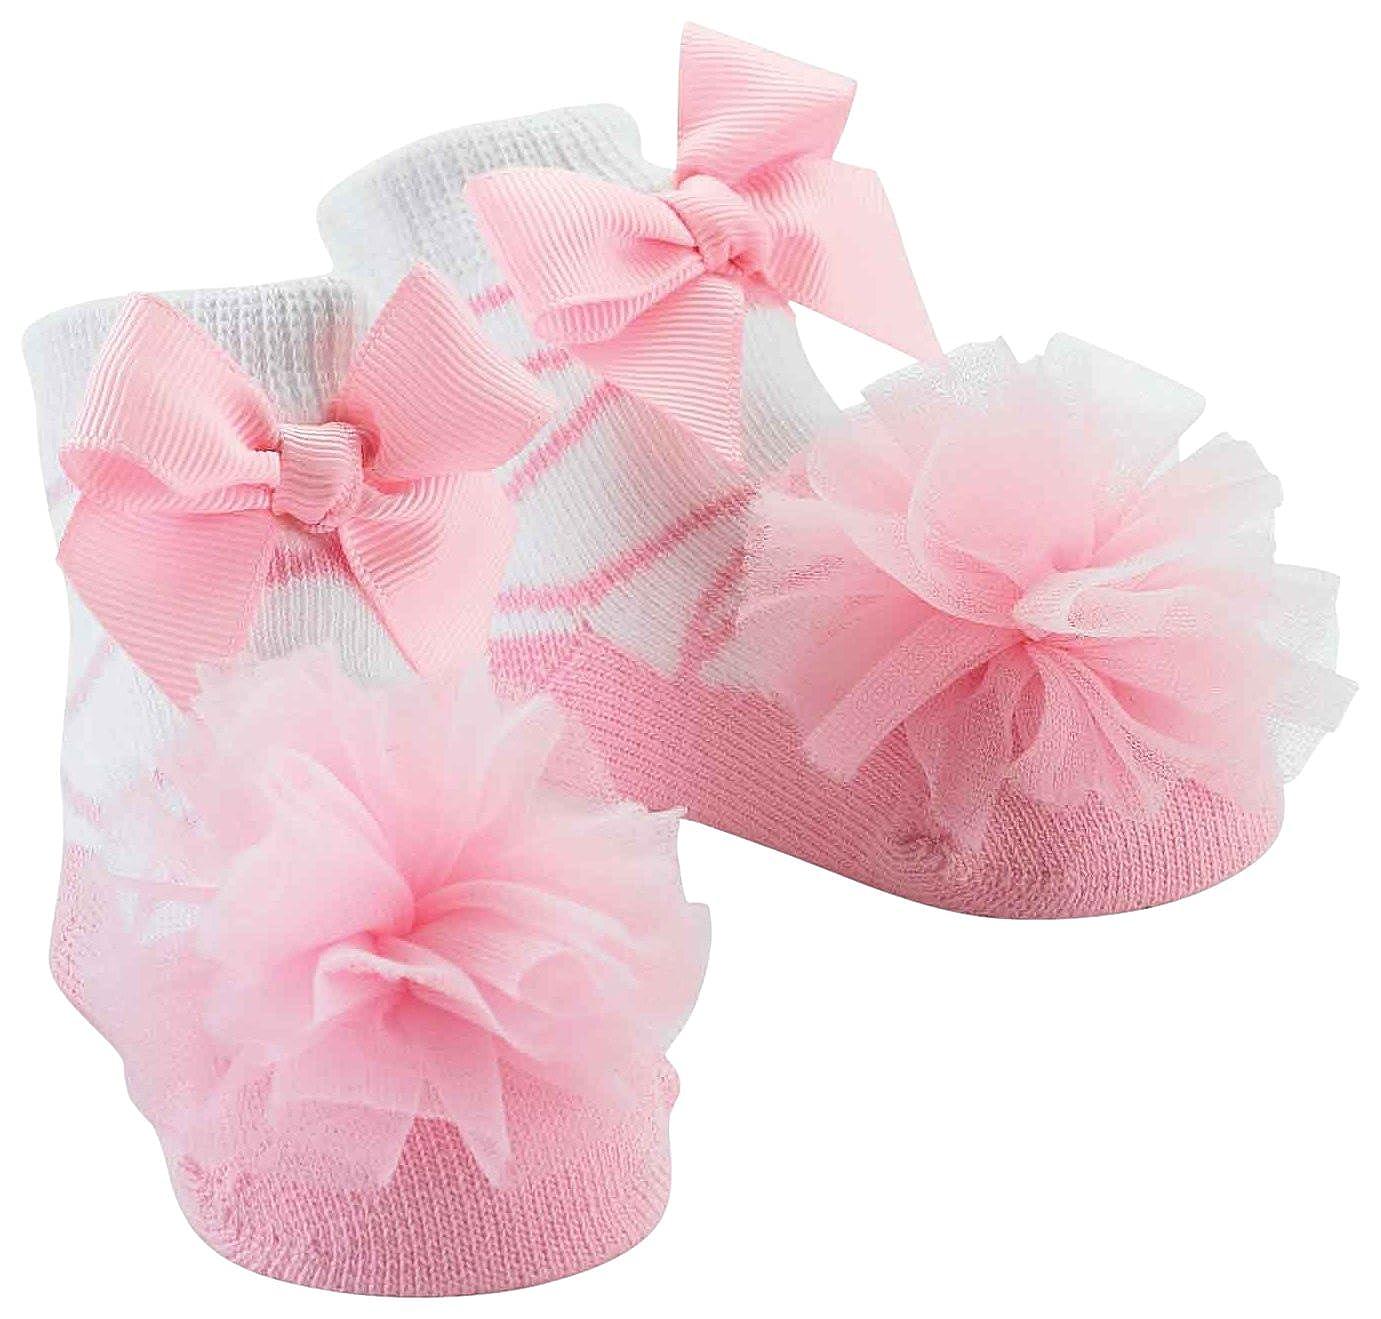 Mud Pie Baby-Girls Newborn Sock Pink Tulle 0-12 Months Mud Pie - Clothing 171964